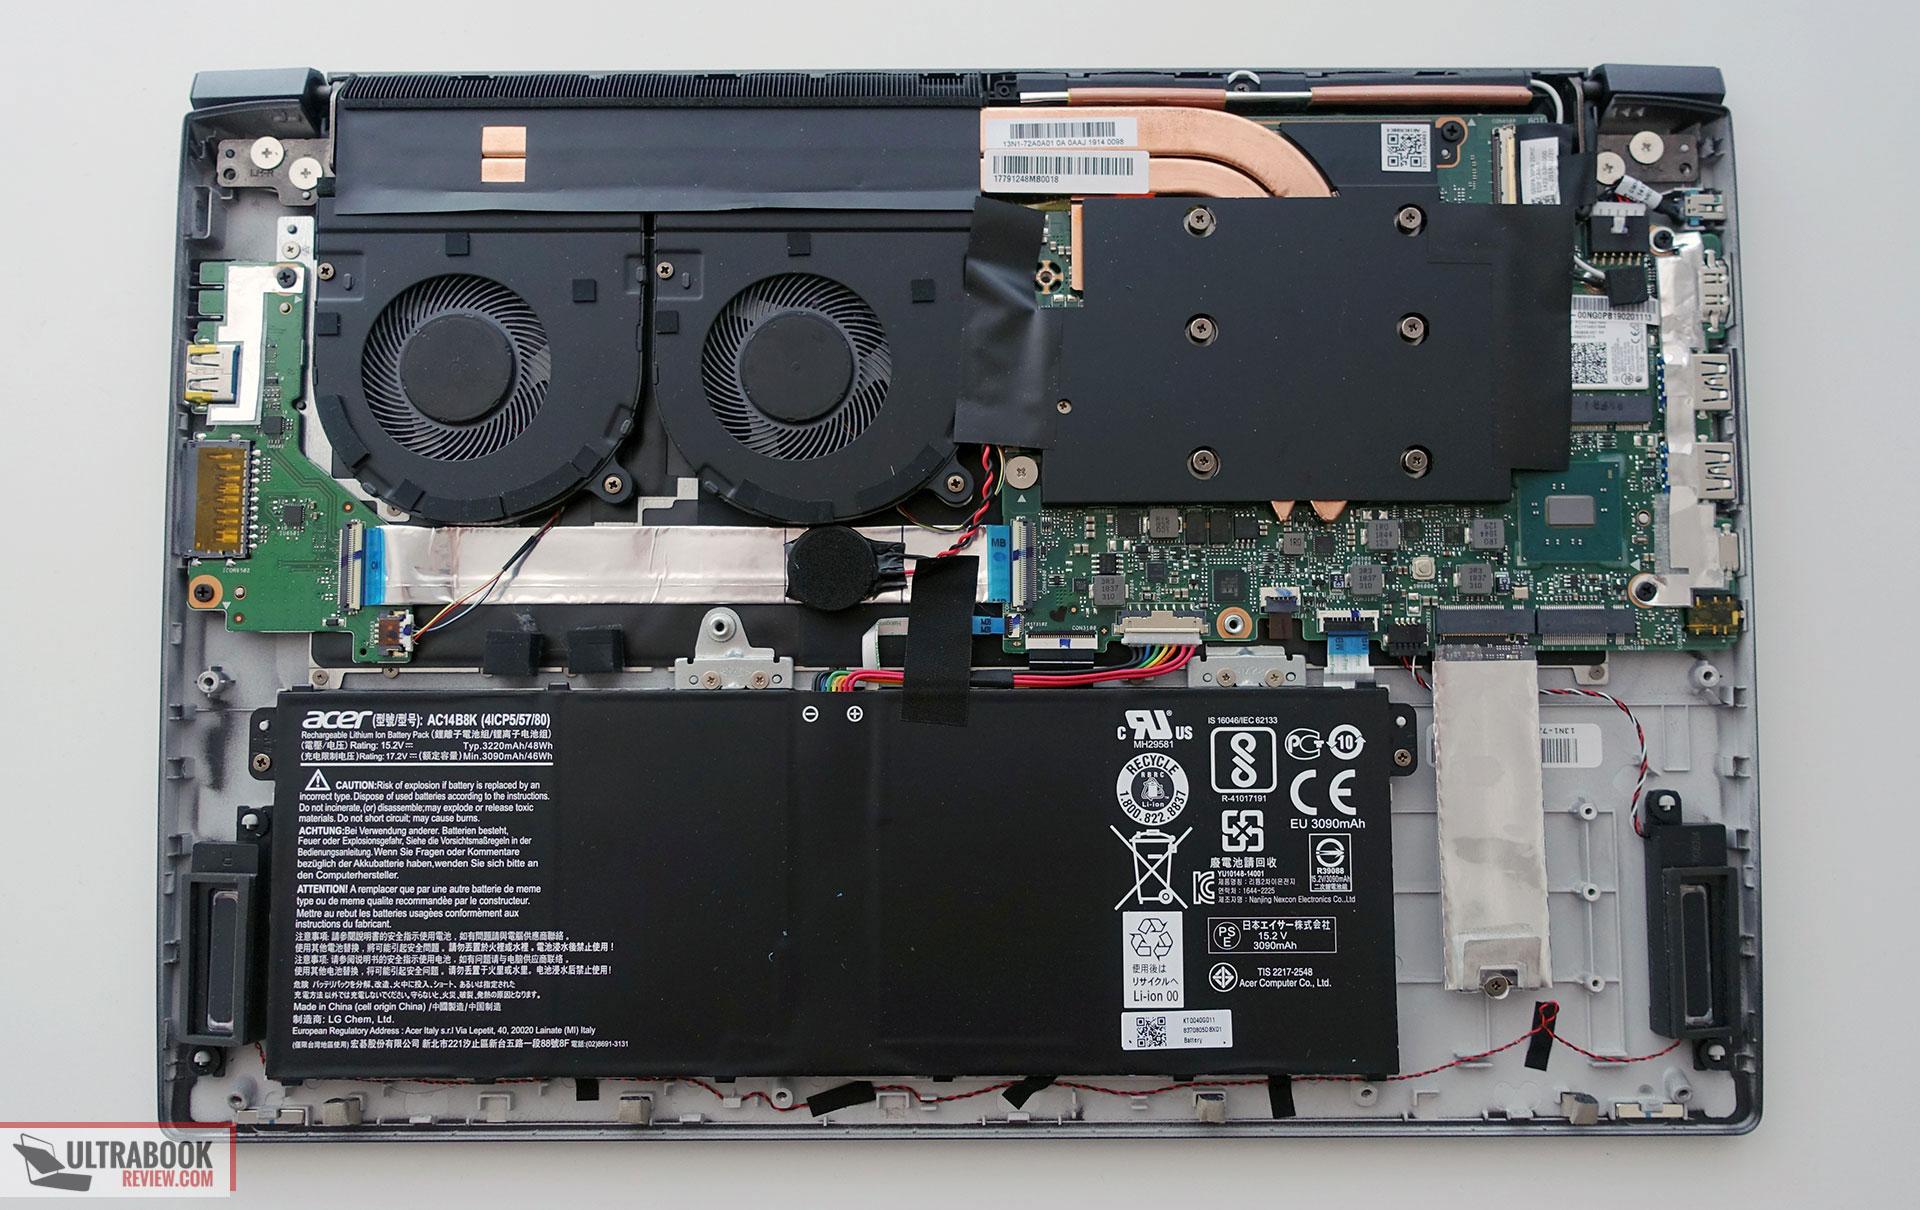 Acer Aspire 7 2019 review (A715-73G model - Core i7-8705G